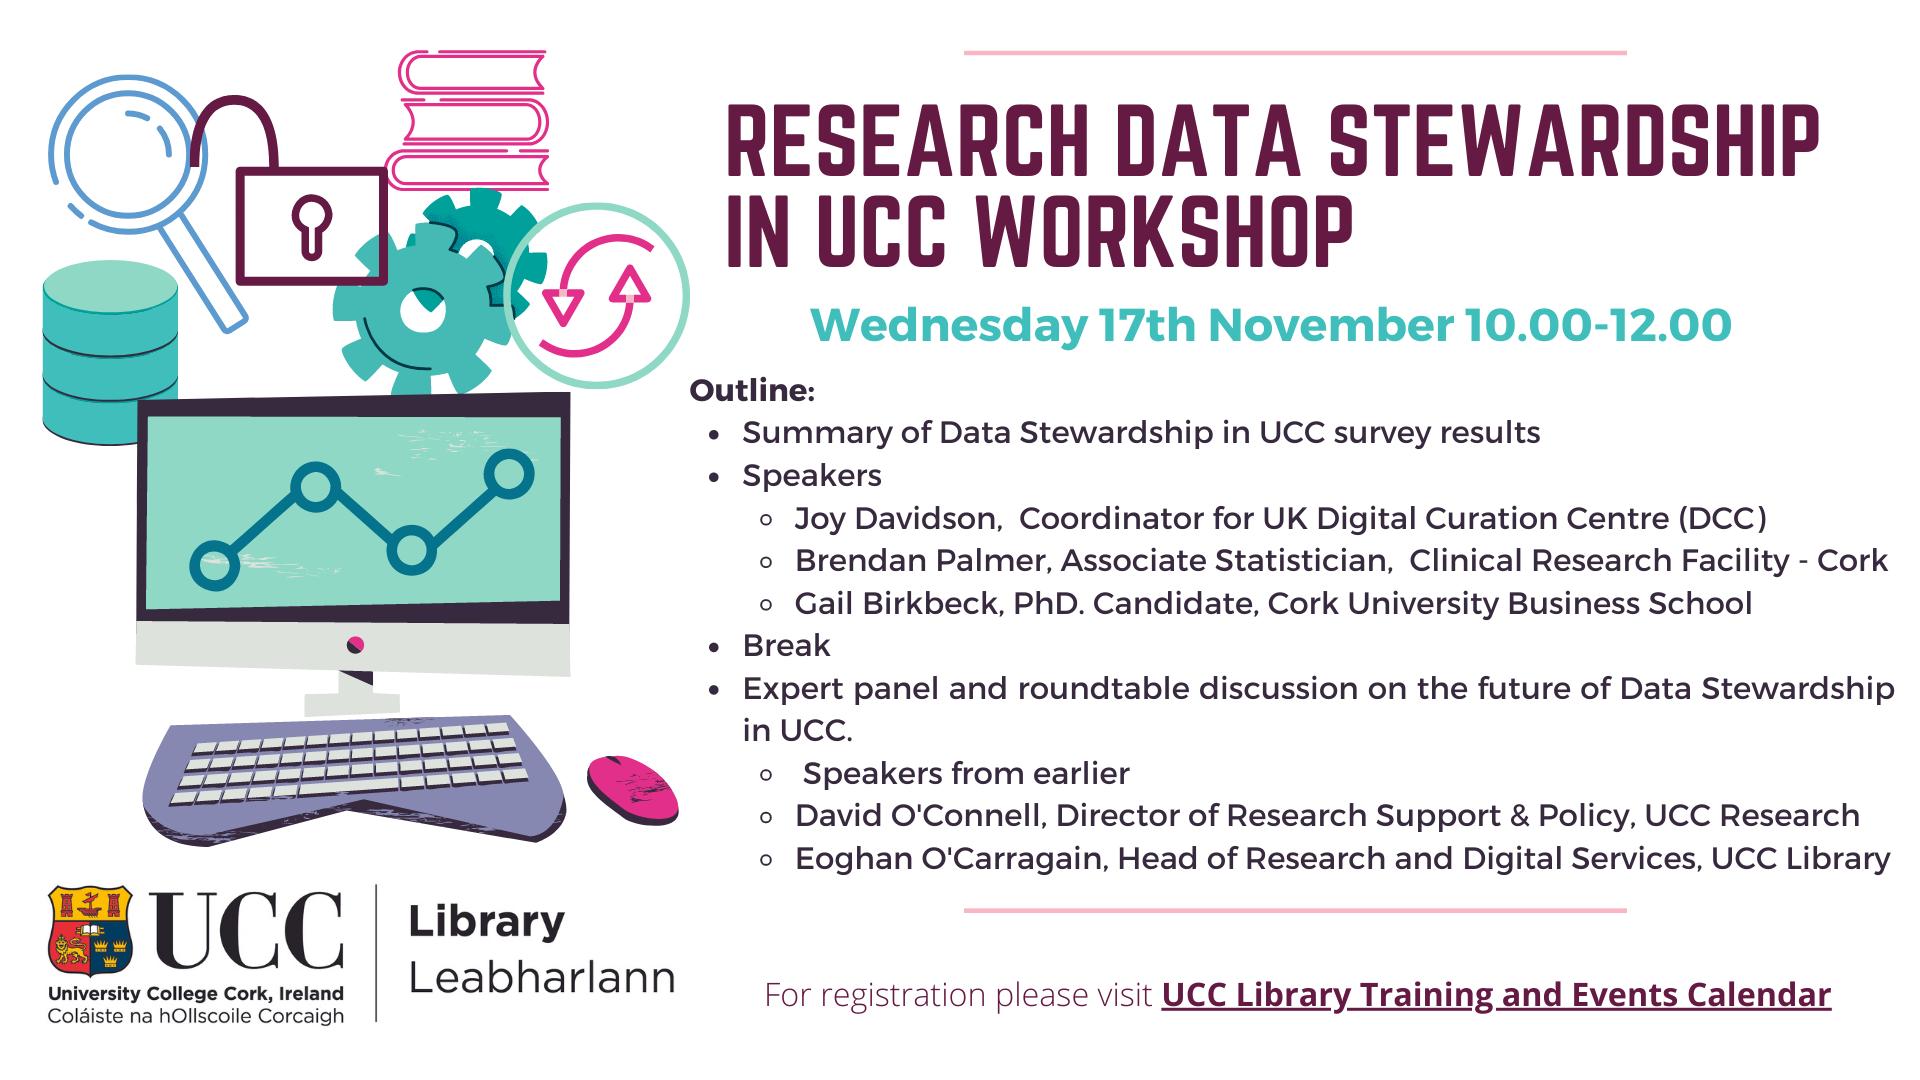 Data Stewardship in UCC